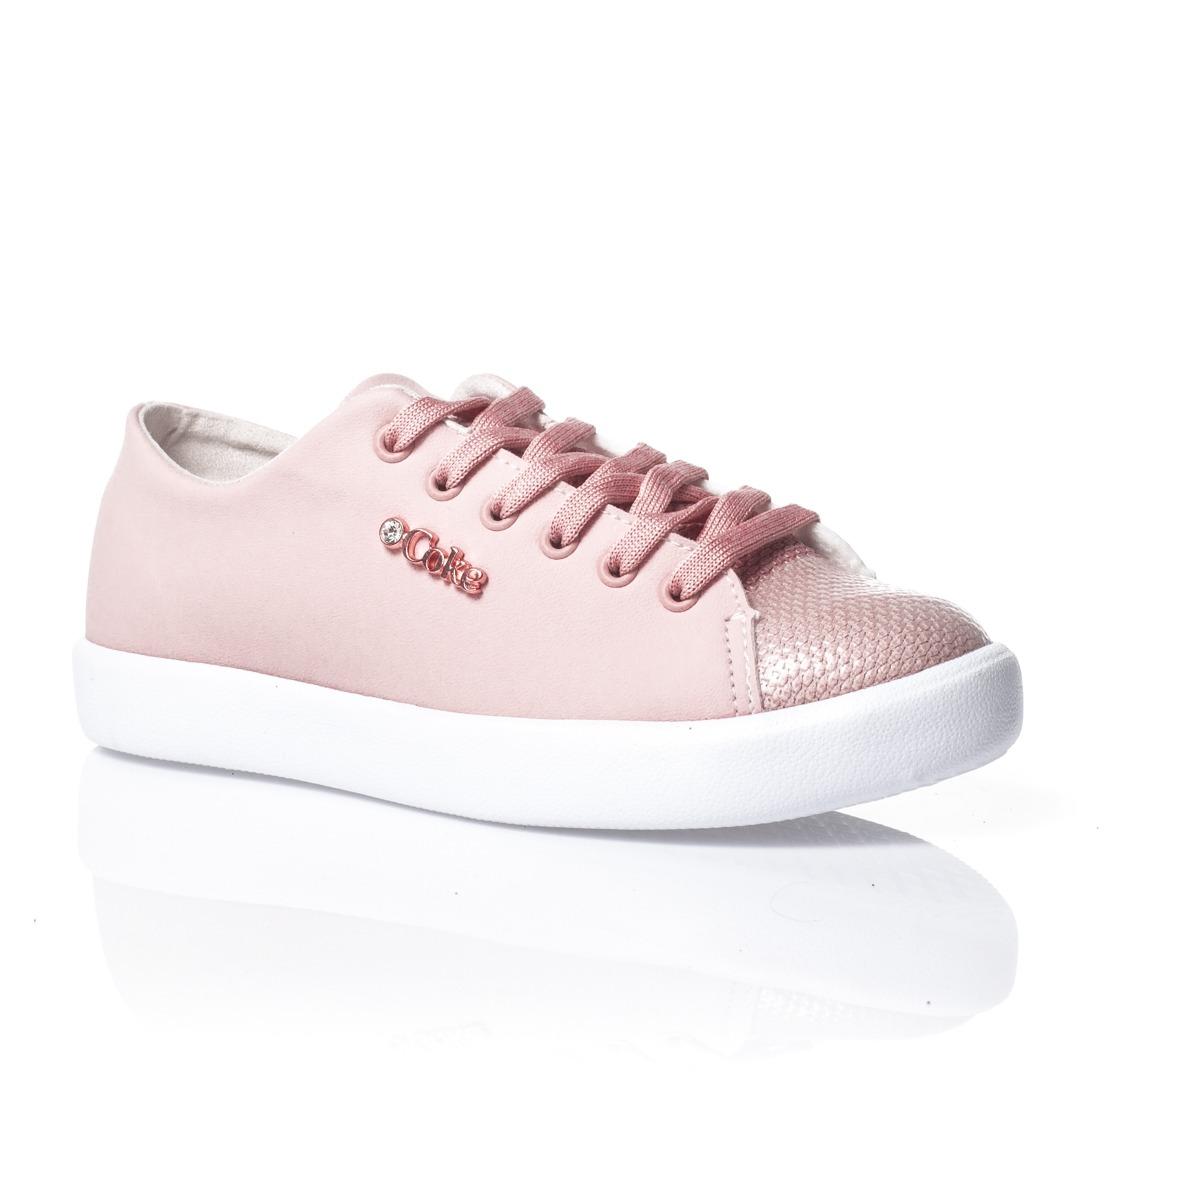 56d50c237f tênis coca-cola shoes luxor low rosa. Carregando zoom.